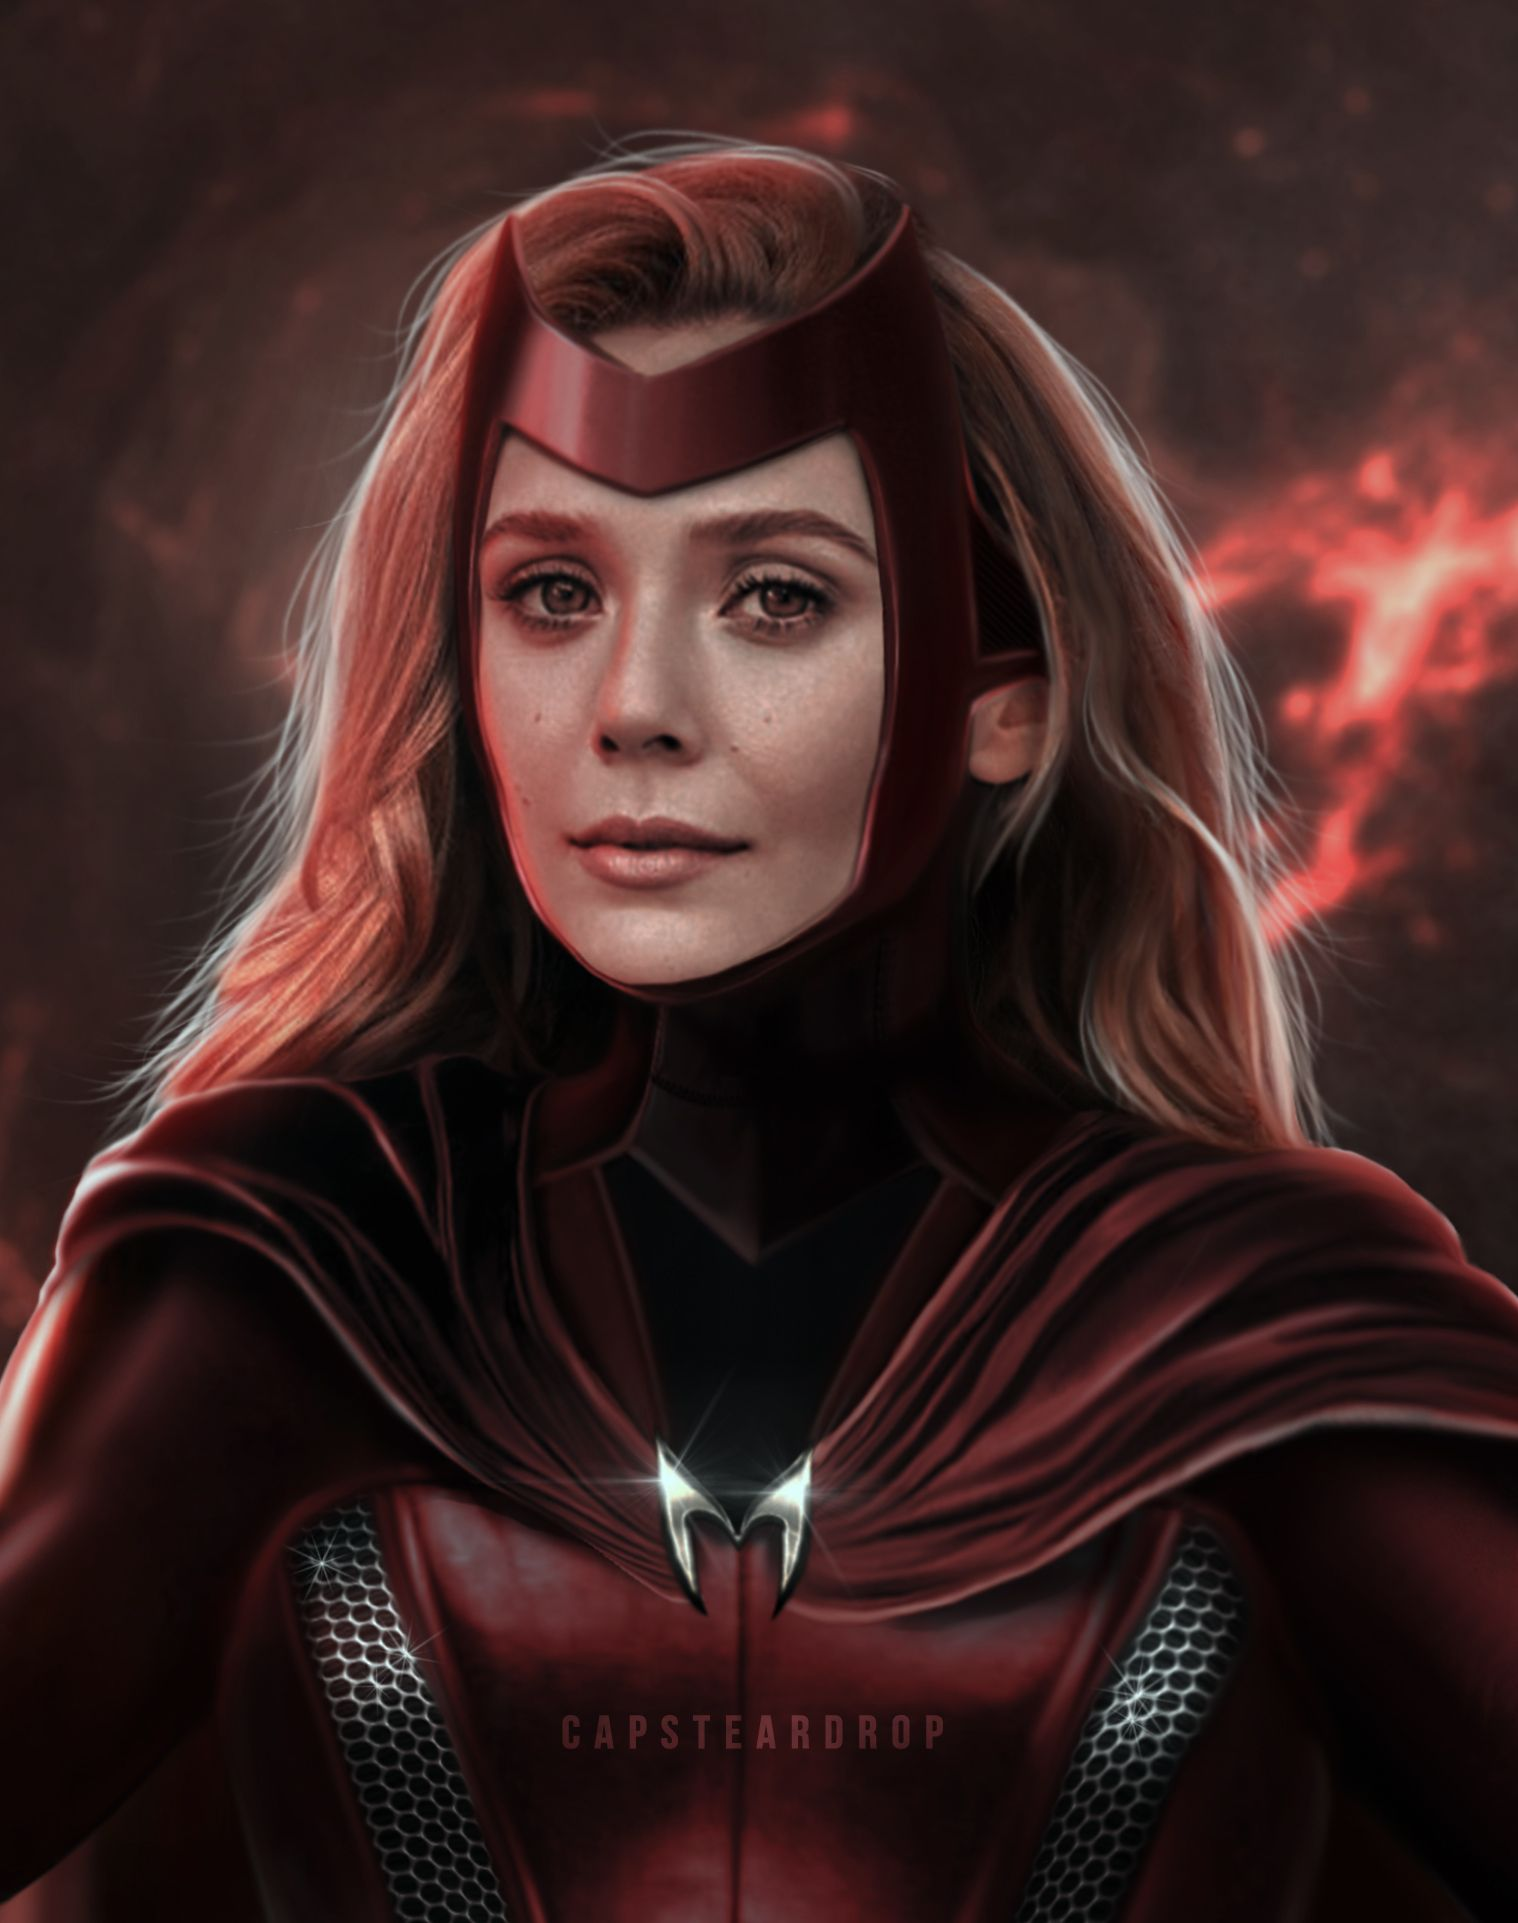 Scarlet Witch Concept Art Portrait In 2020 Scarlet Witch Scarlet Witch Marvel Marvel Concept Art